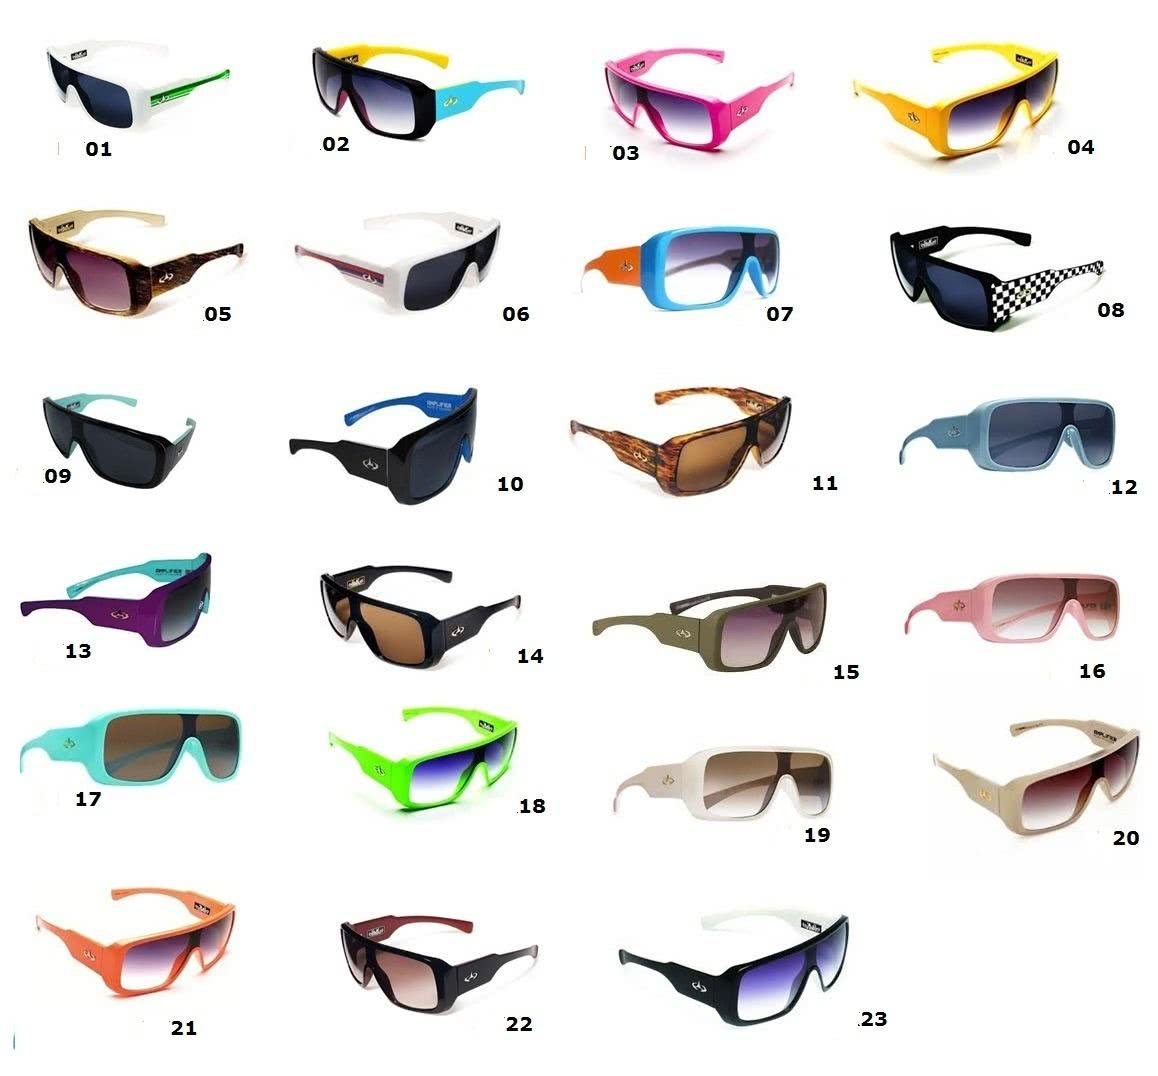 d2a614e311bf8 Onde Comprar Oculos De Sol Da Marca Atitude   City of Kenmore ...